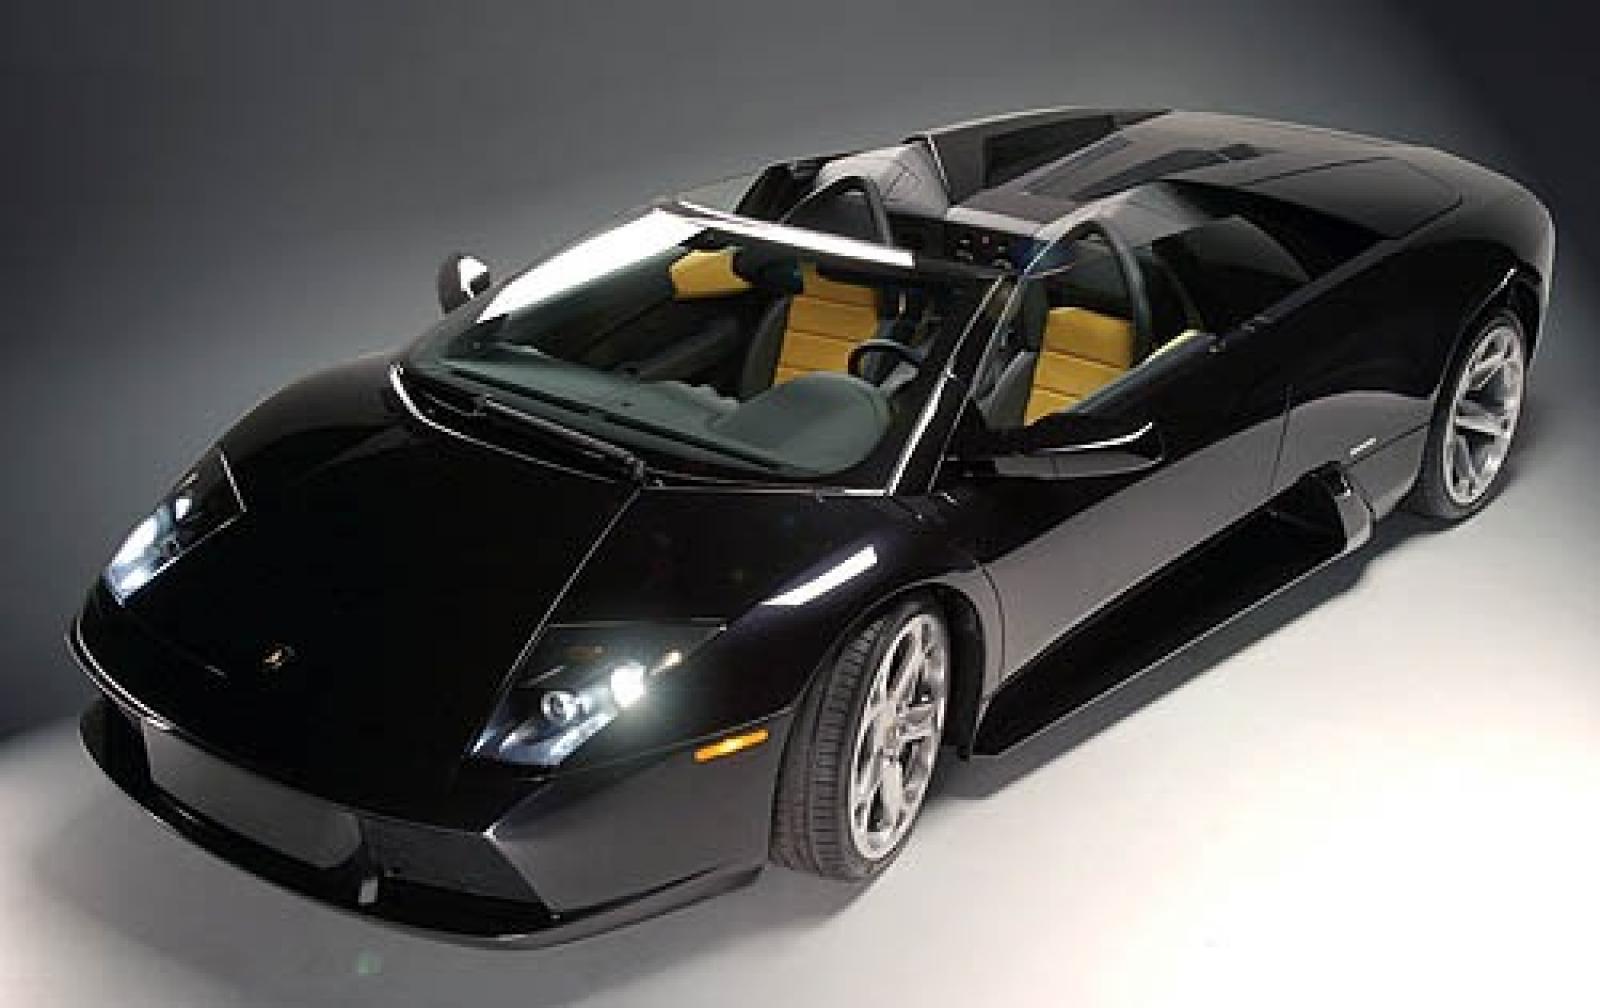 2006 Lamborghini Murcielago Information And Photos Zombiedrive